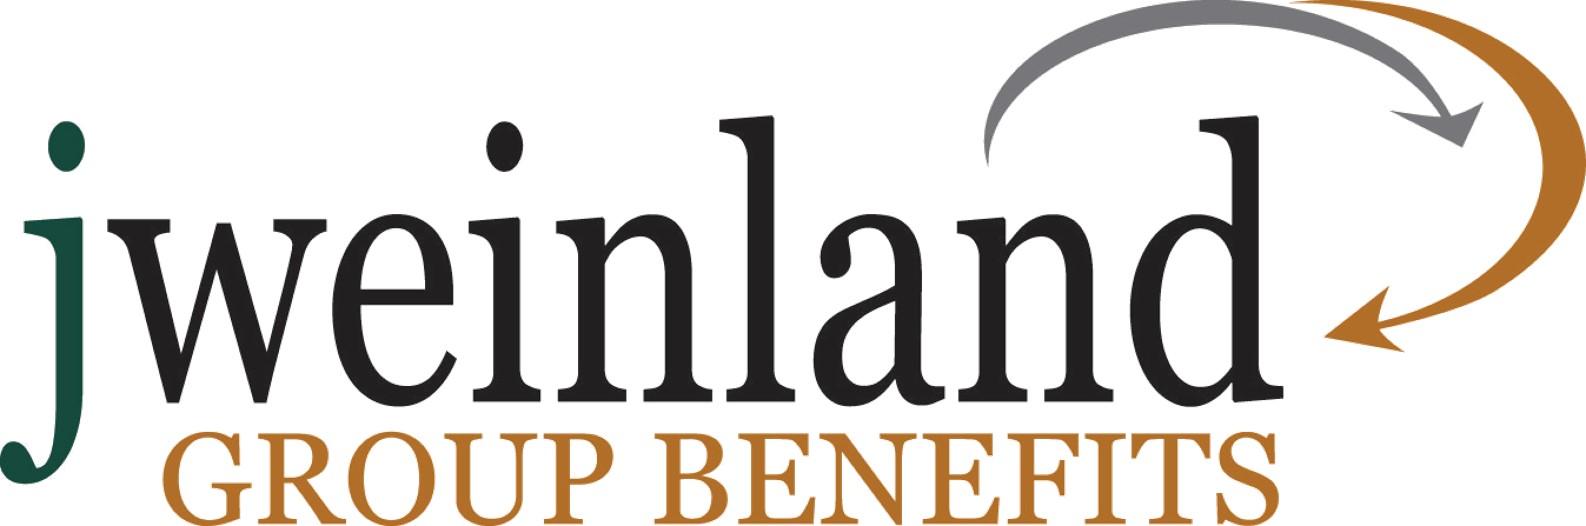 jWeinland Group Benefits